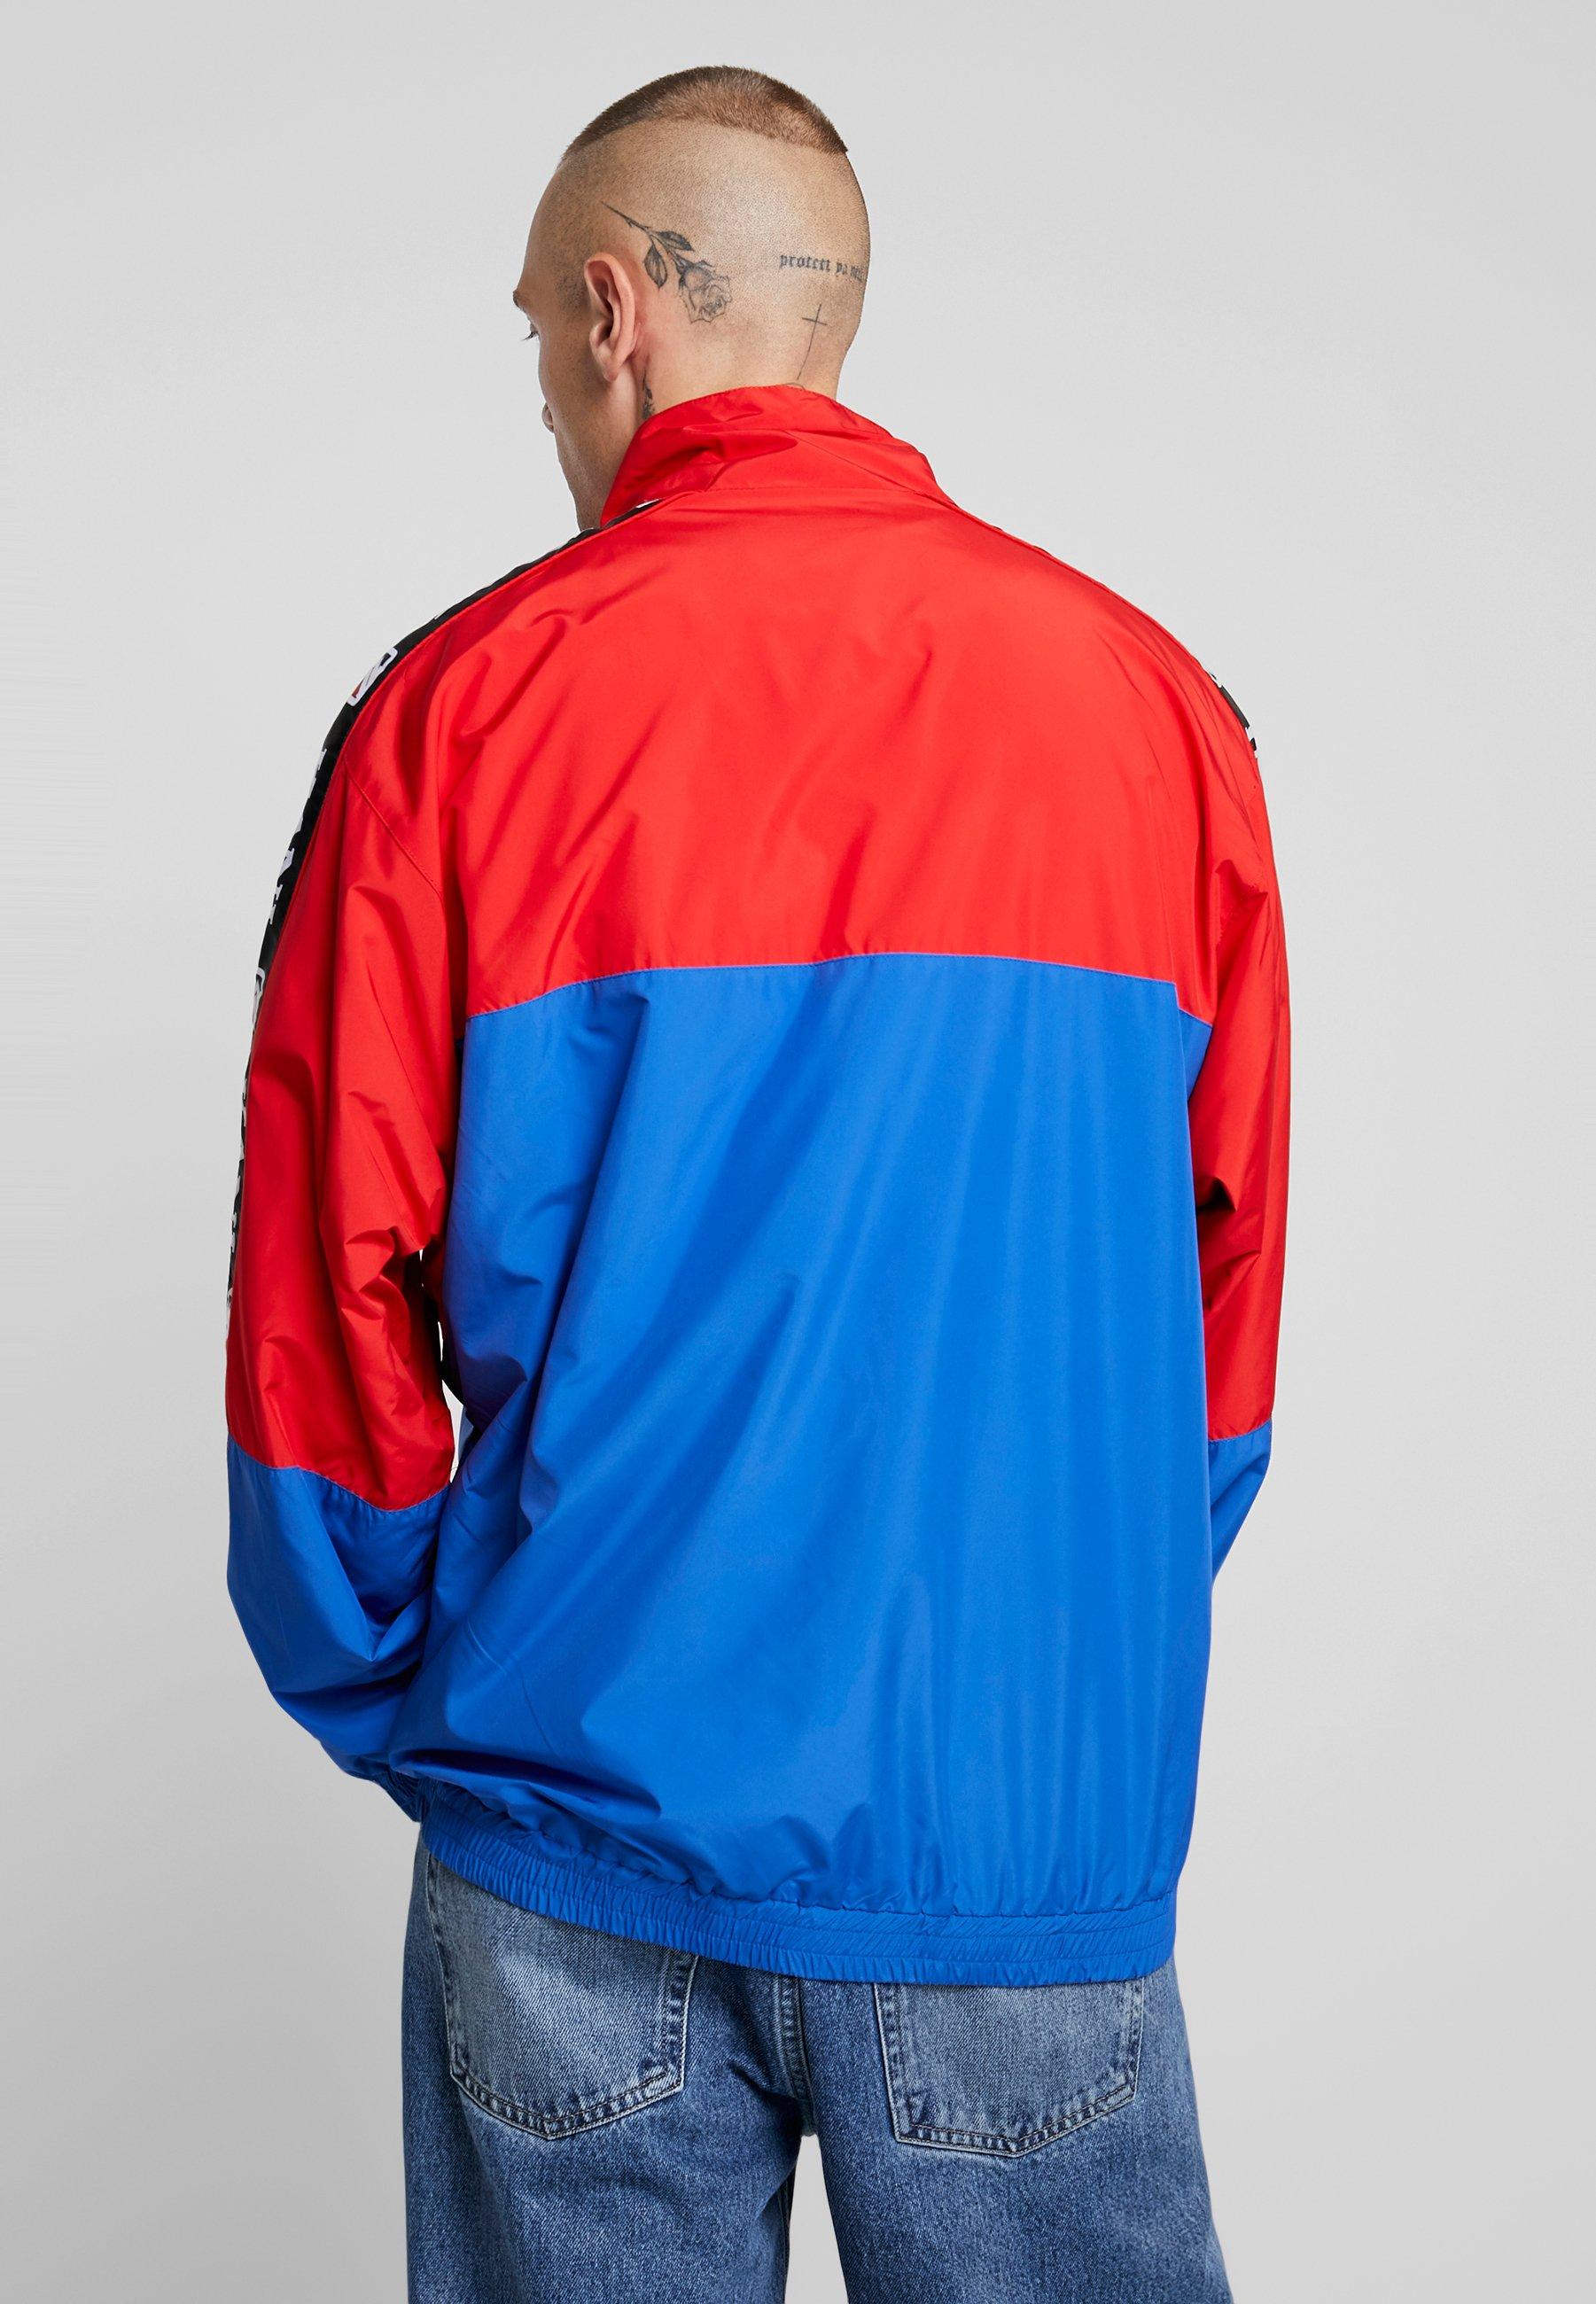 blue yellow TrackjacketVeste De Survêtement Red Kani Block Karl Retro j4RL5A